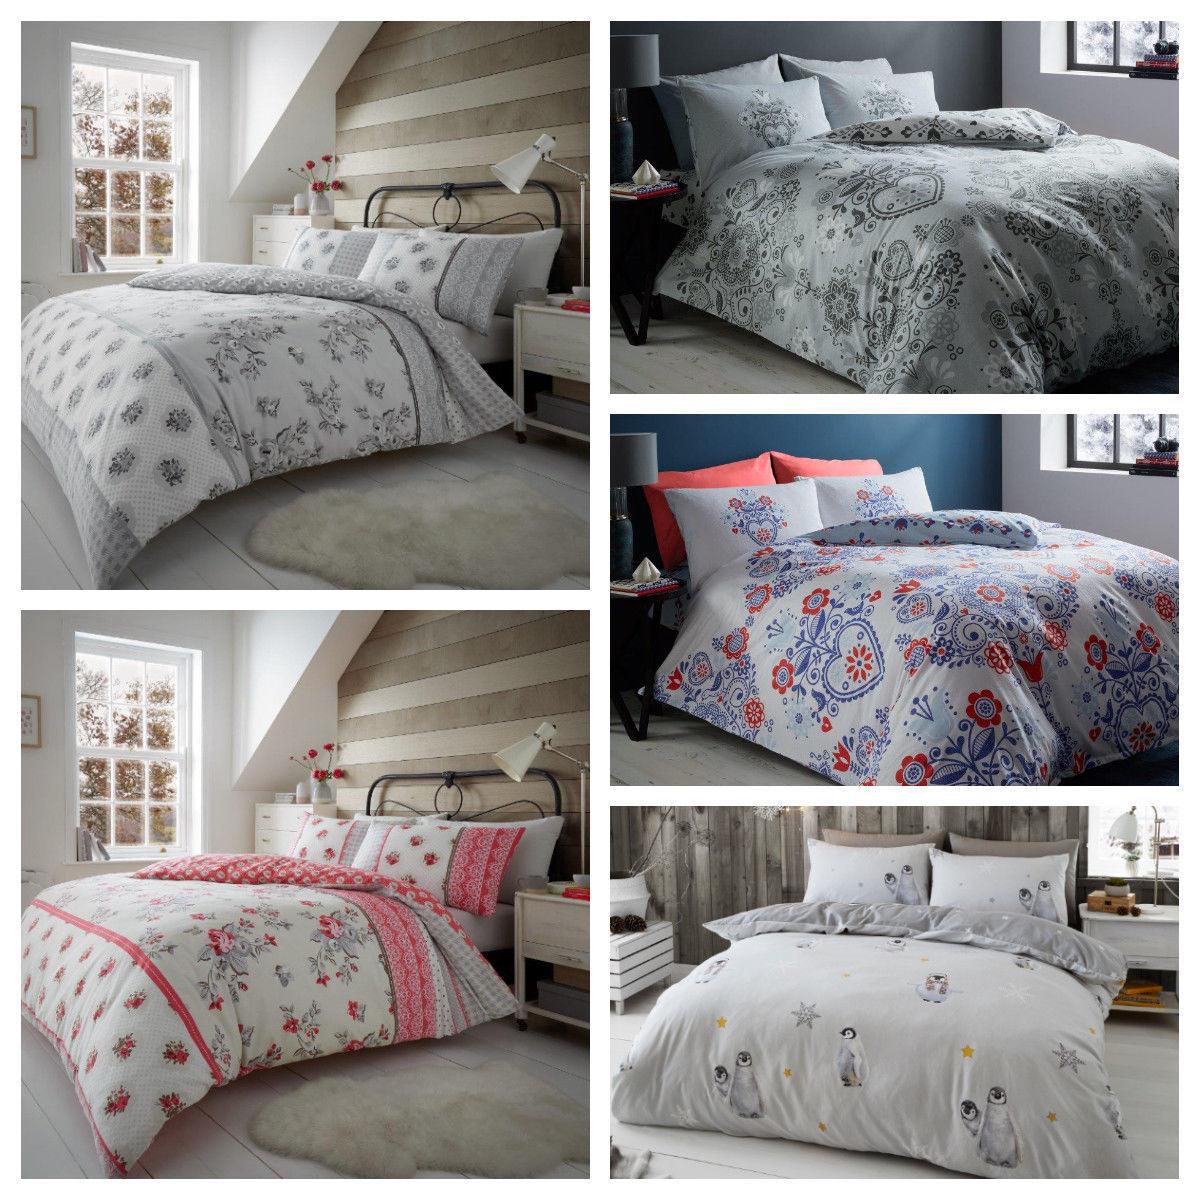 Flannelette Duvet Cover Bedding Set Matching Pillowcases 100